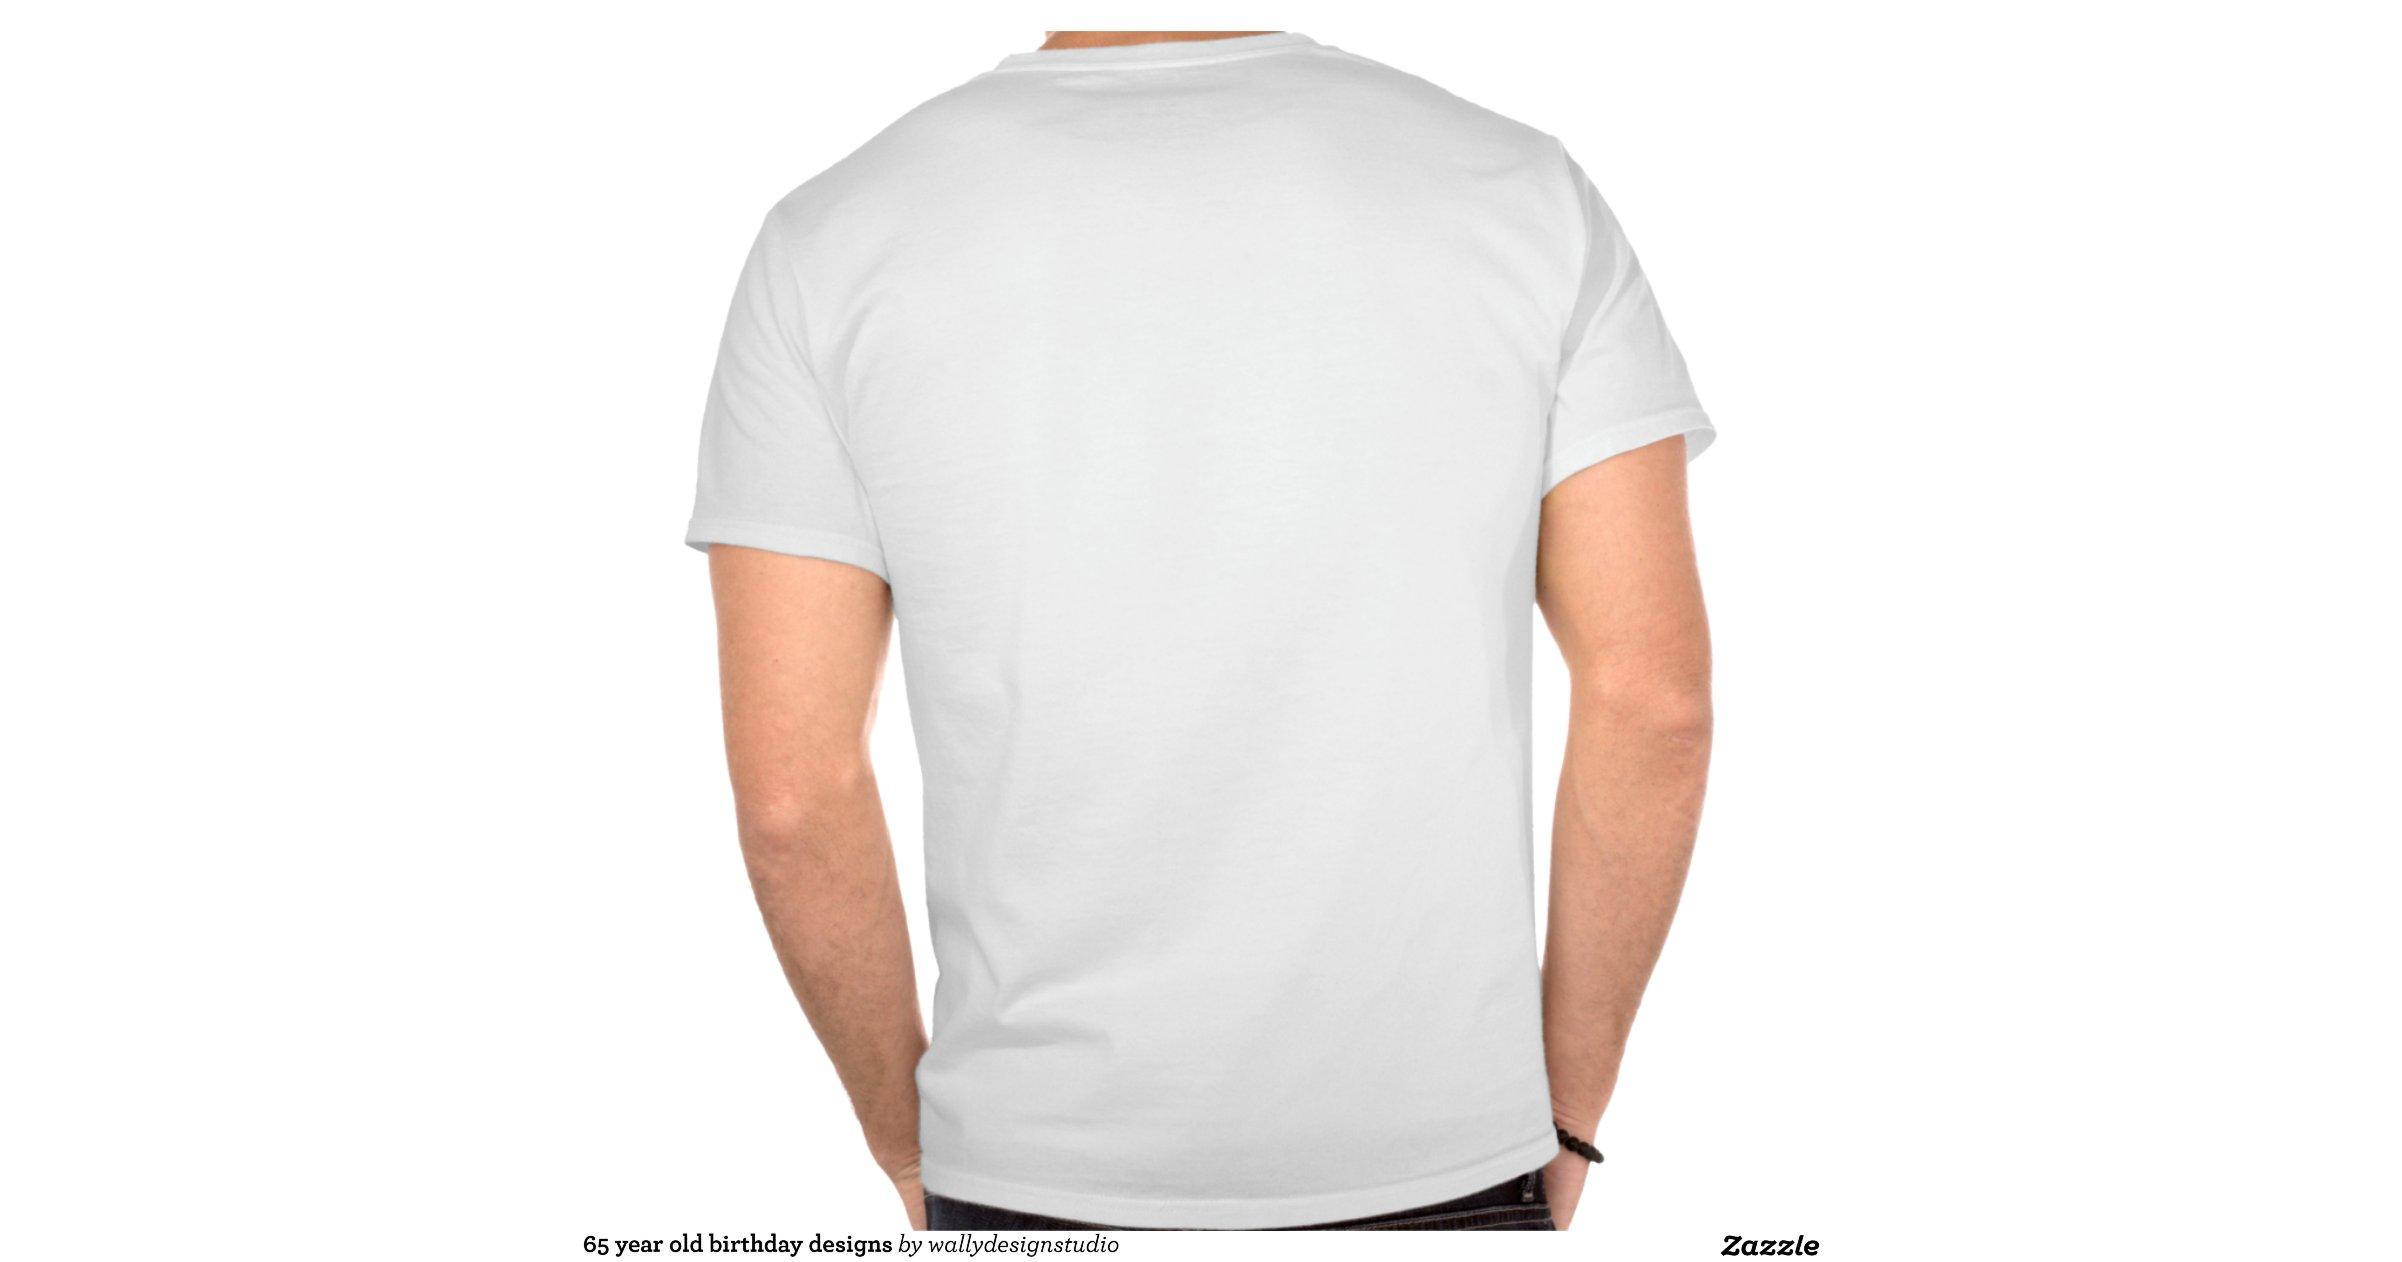 65 year old birthday designs t shirts zazzle Design t shirt australia